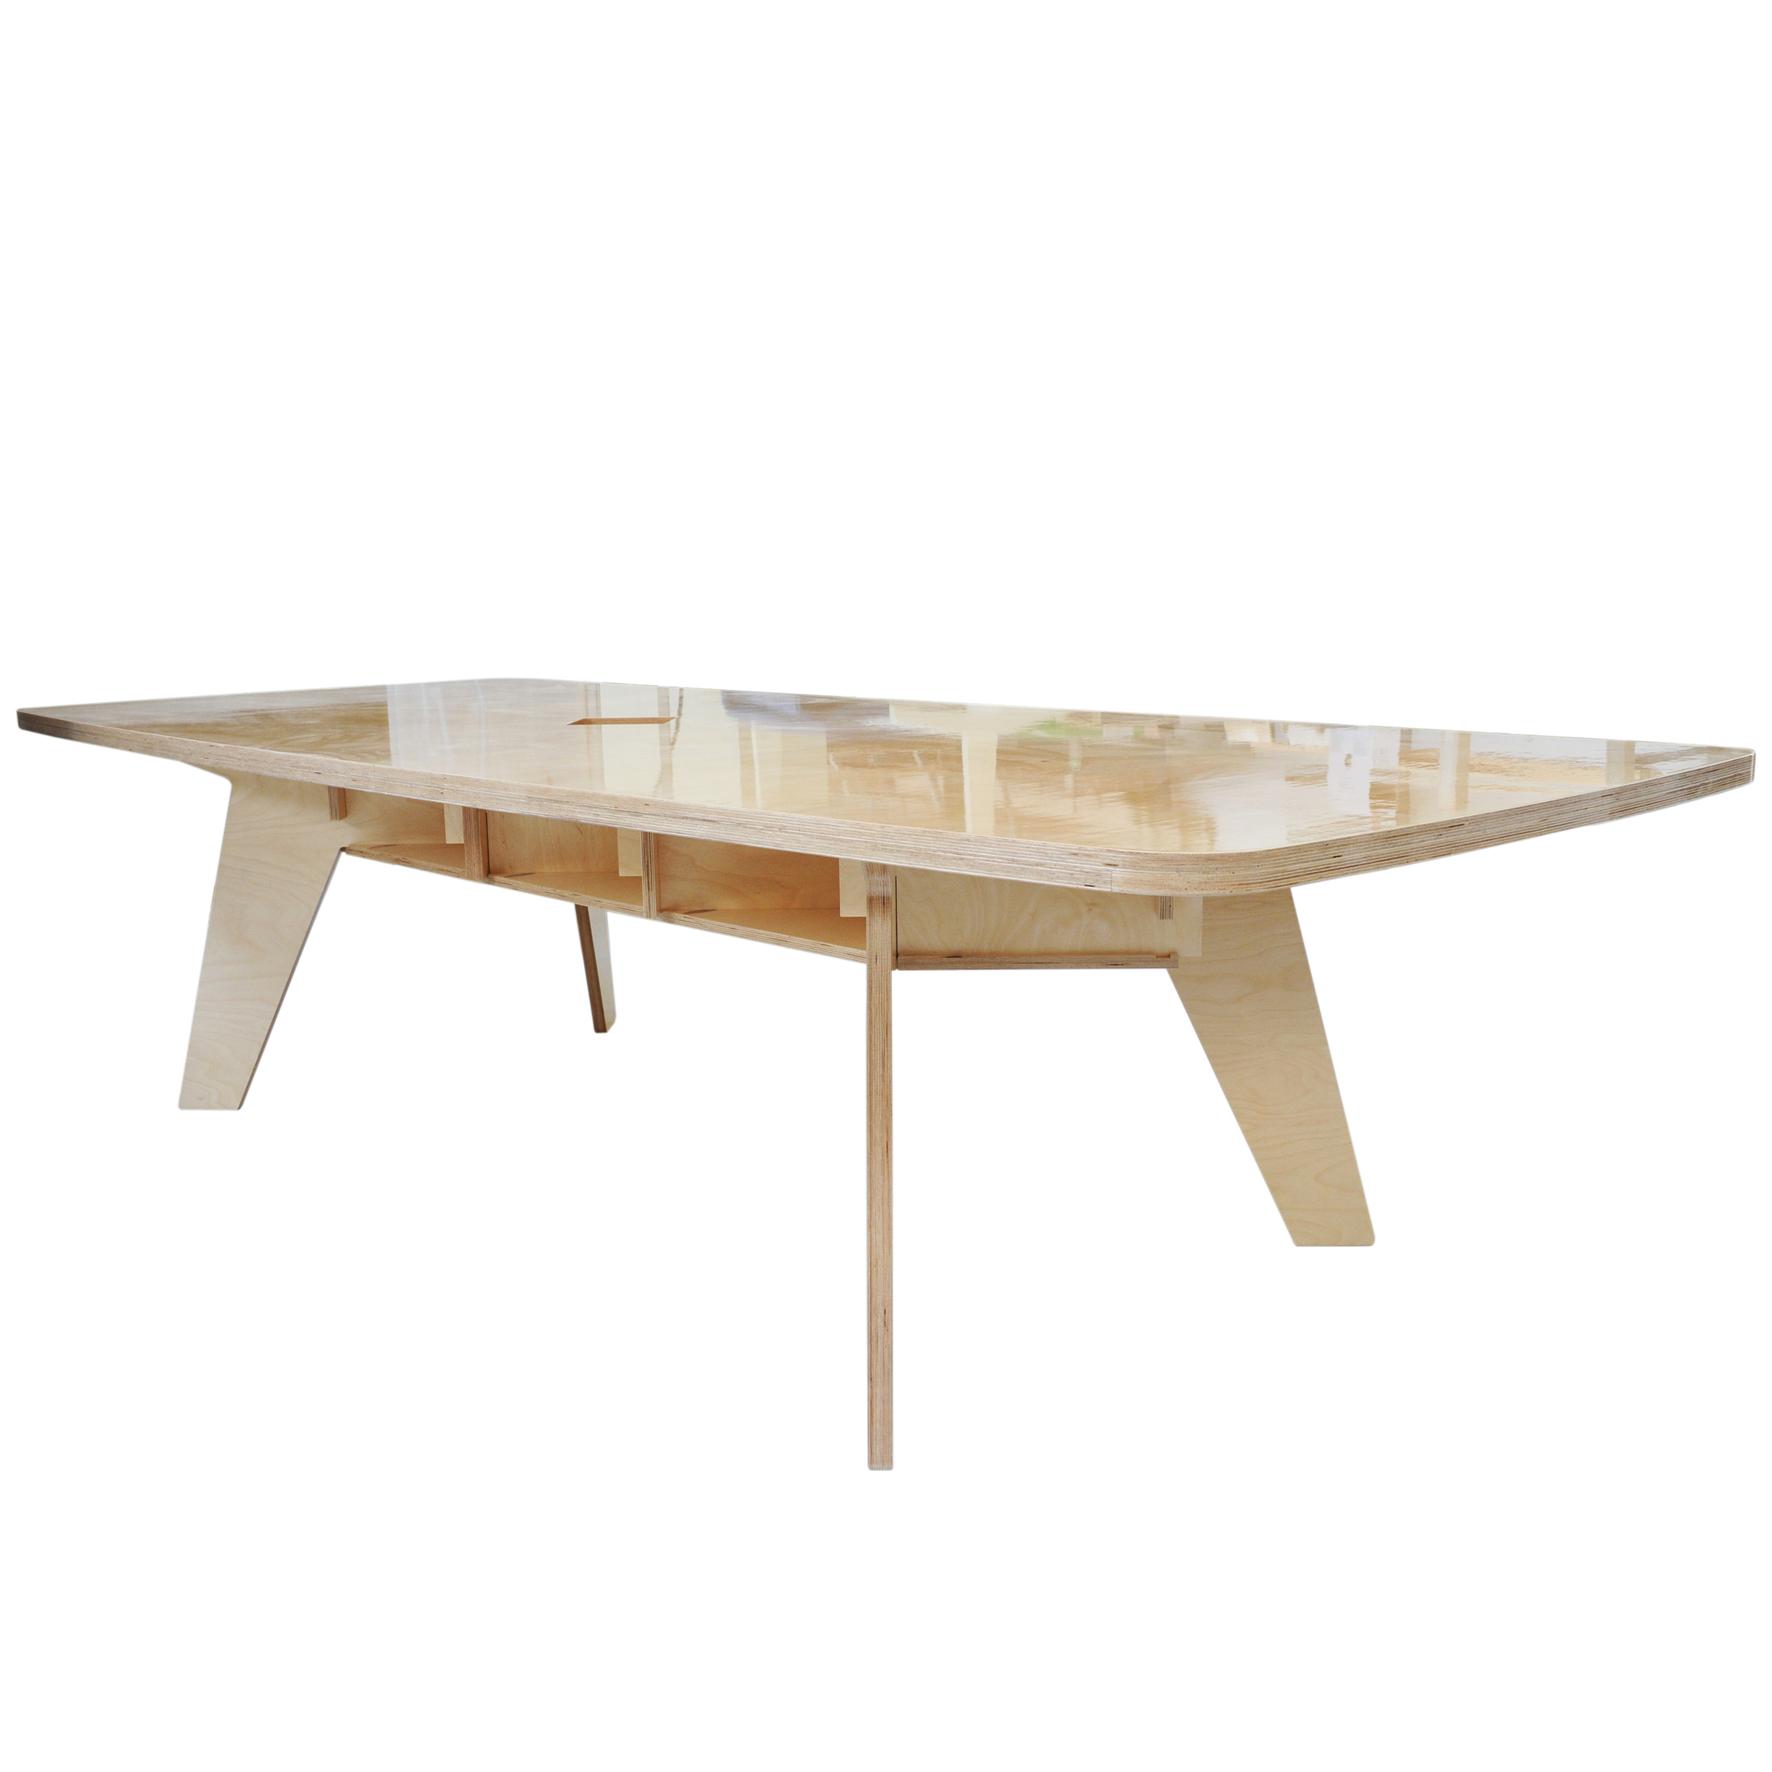 crisistafel-vakwerk-300x130x75